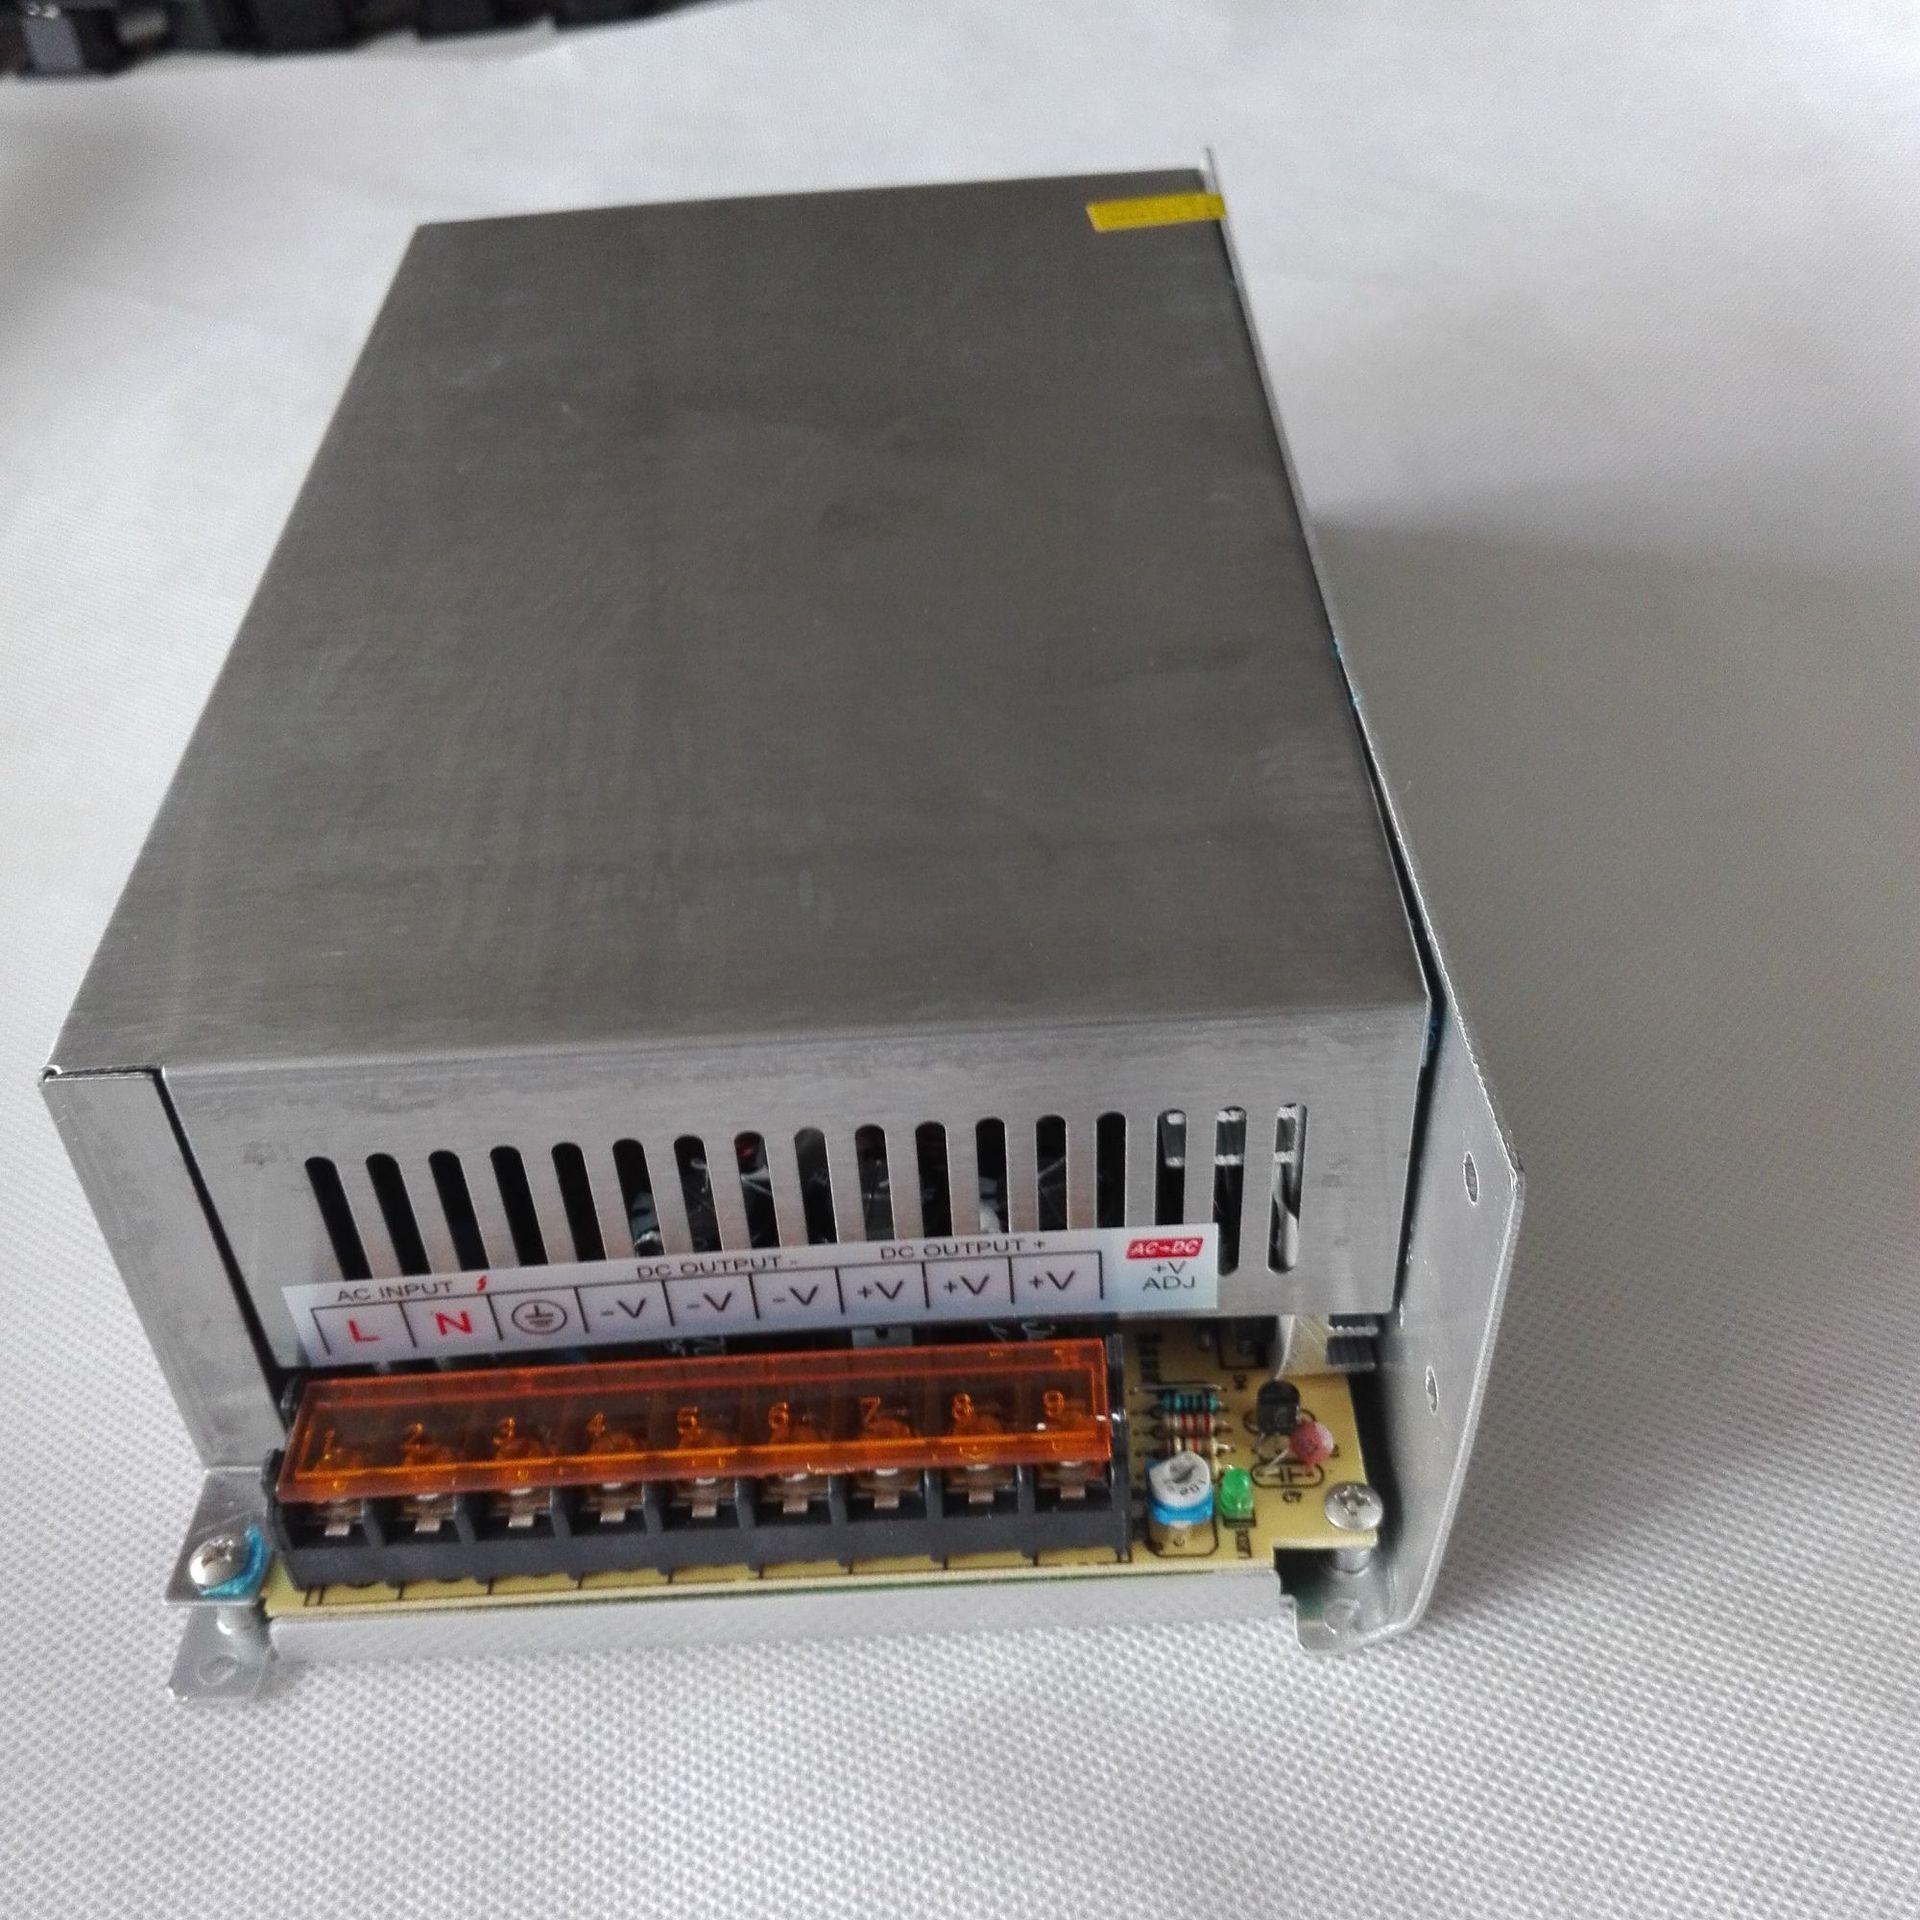 48V10A,开关电源,48V500W,直流稳压,机电设备机械工程大功率电源